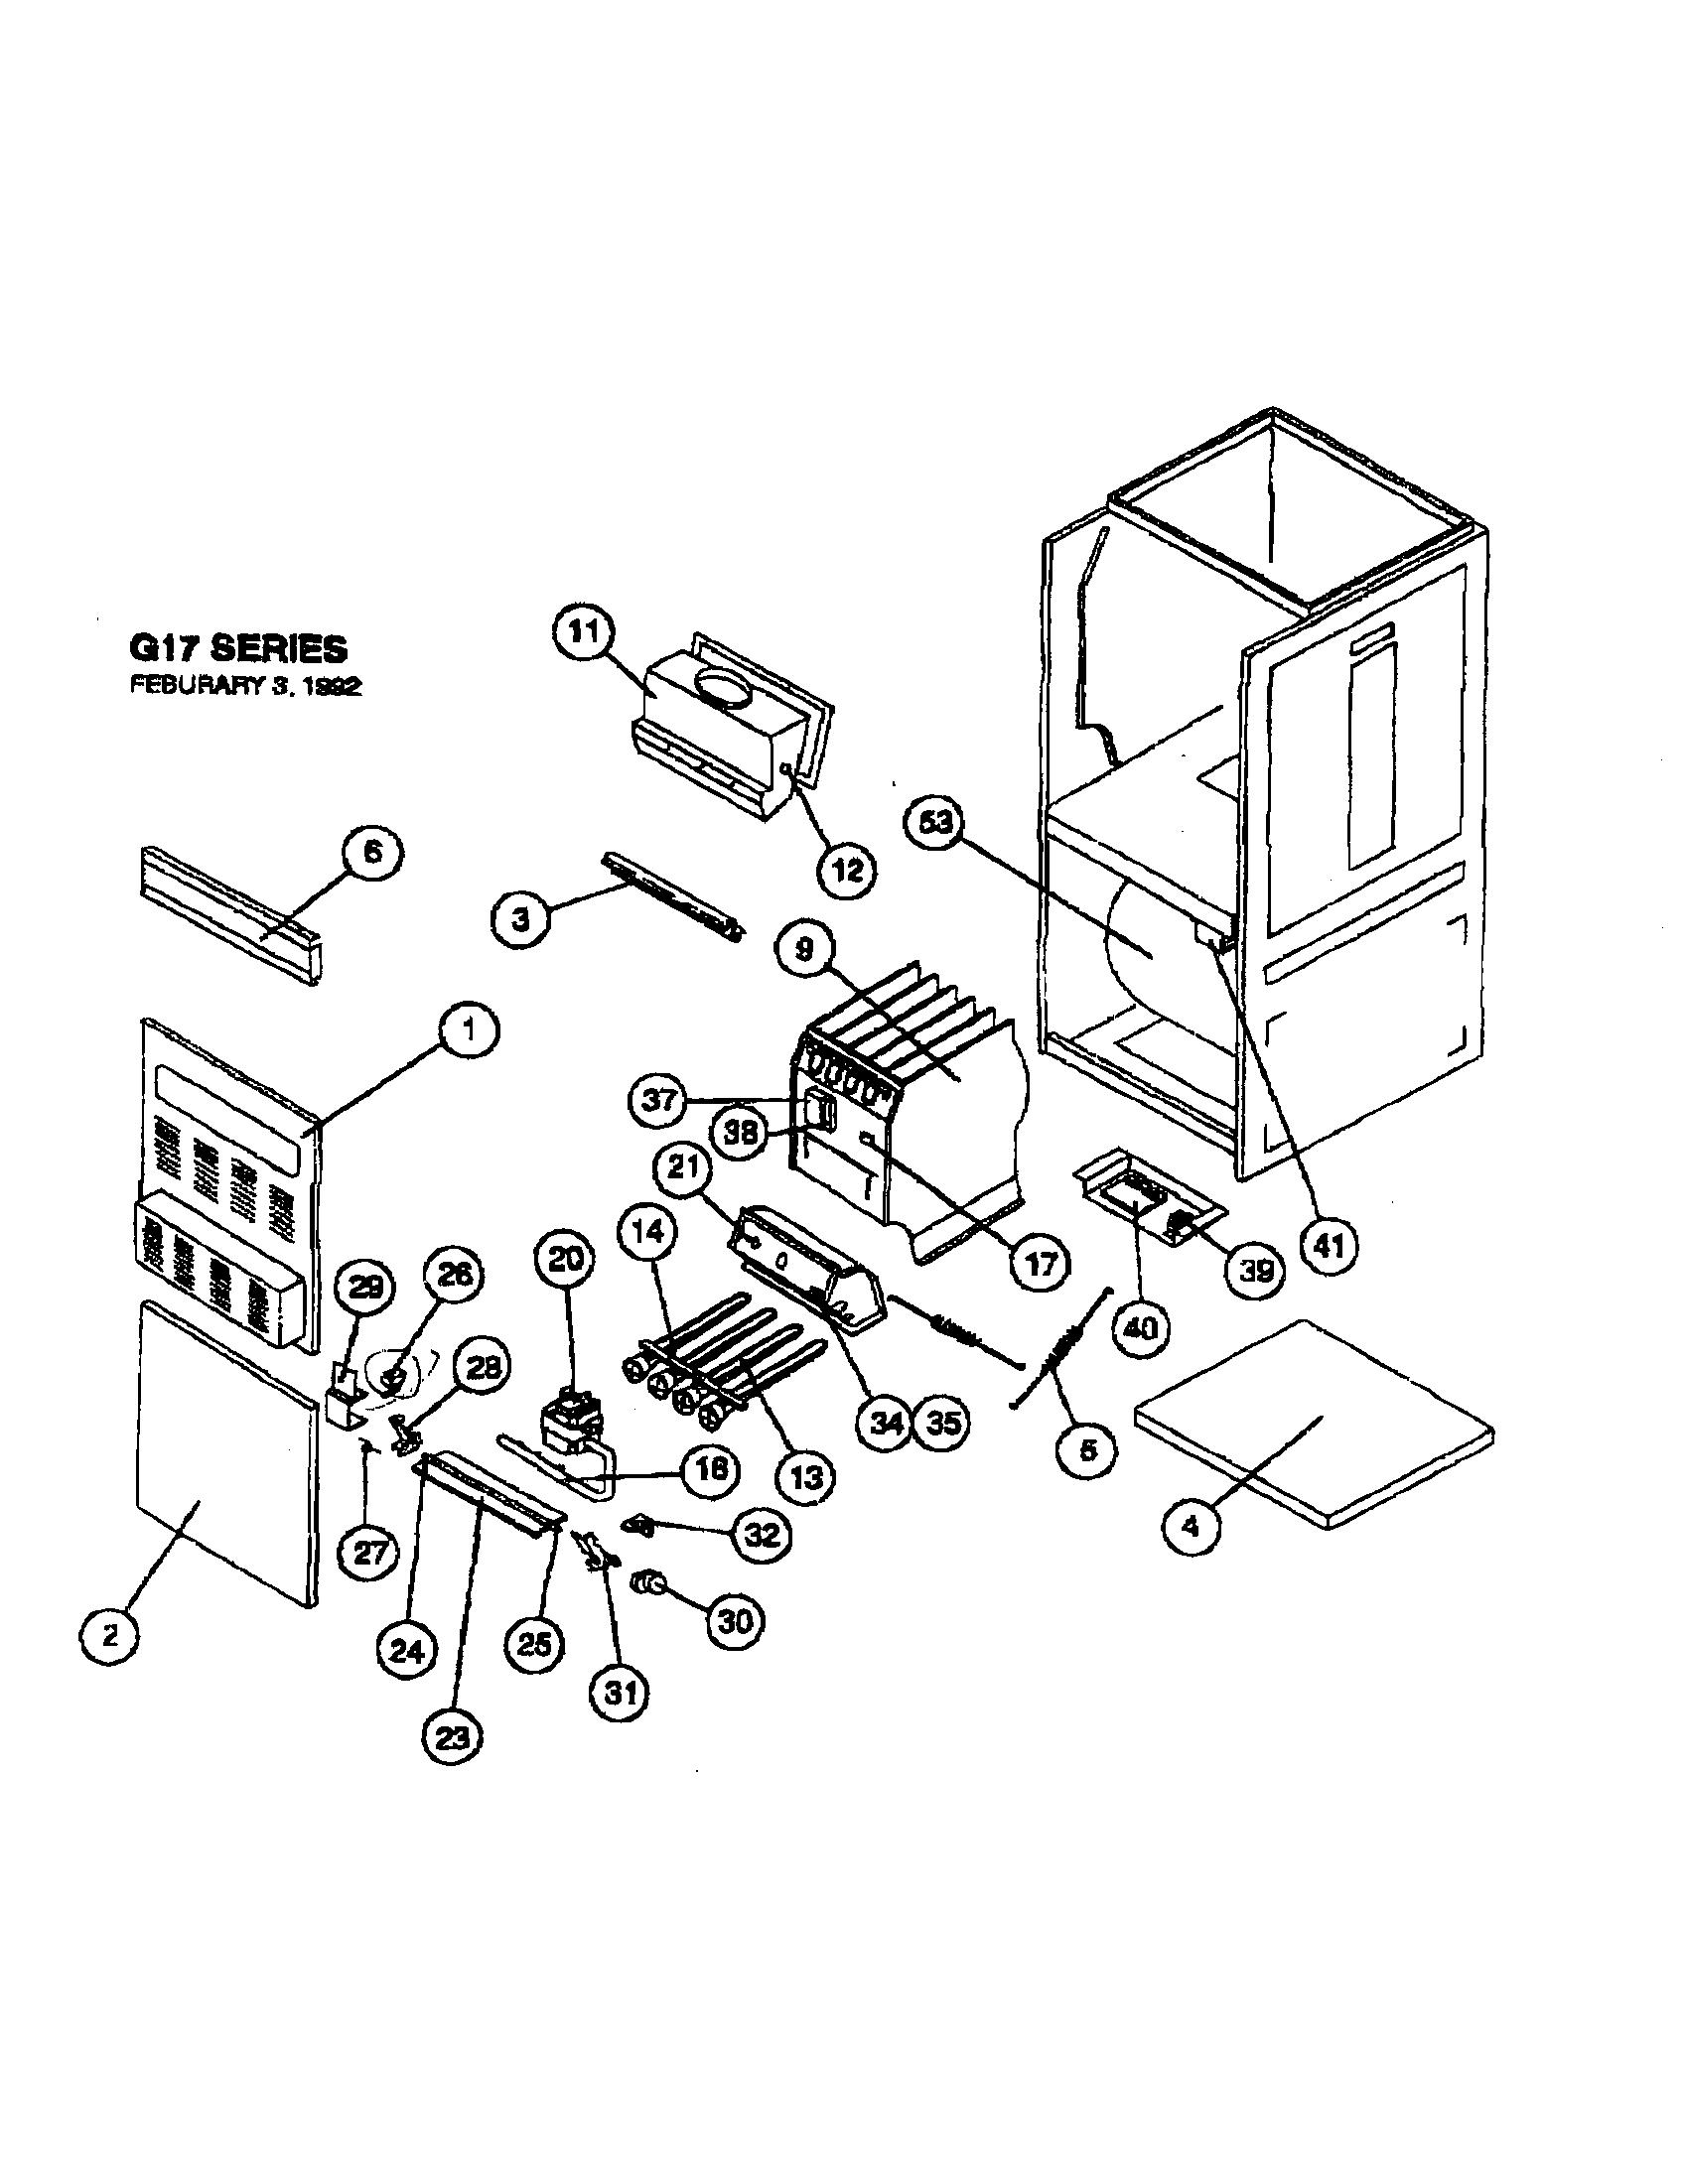 Furnace Parts Diagram